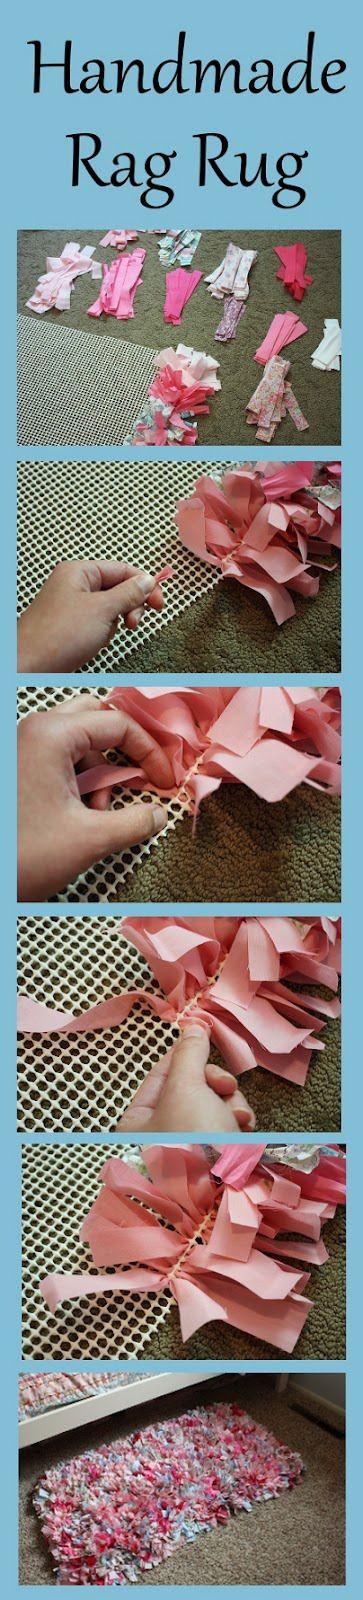 Handmade Rag Rug Tutorial